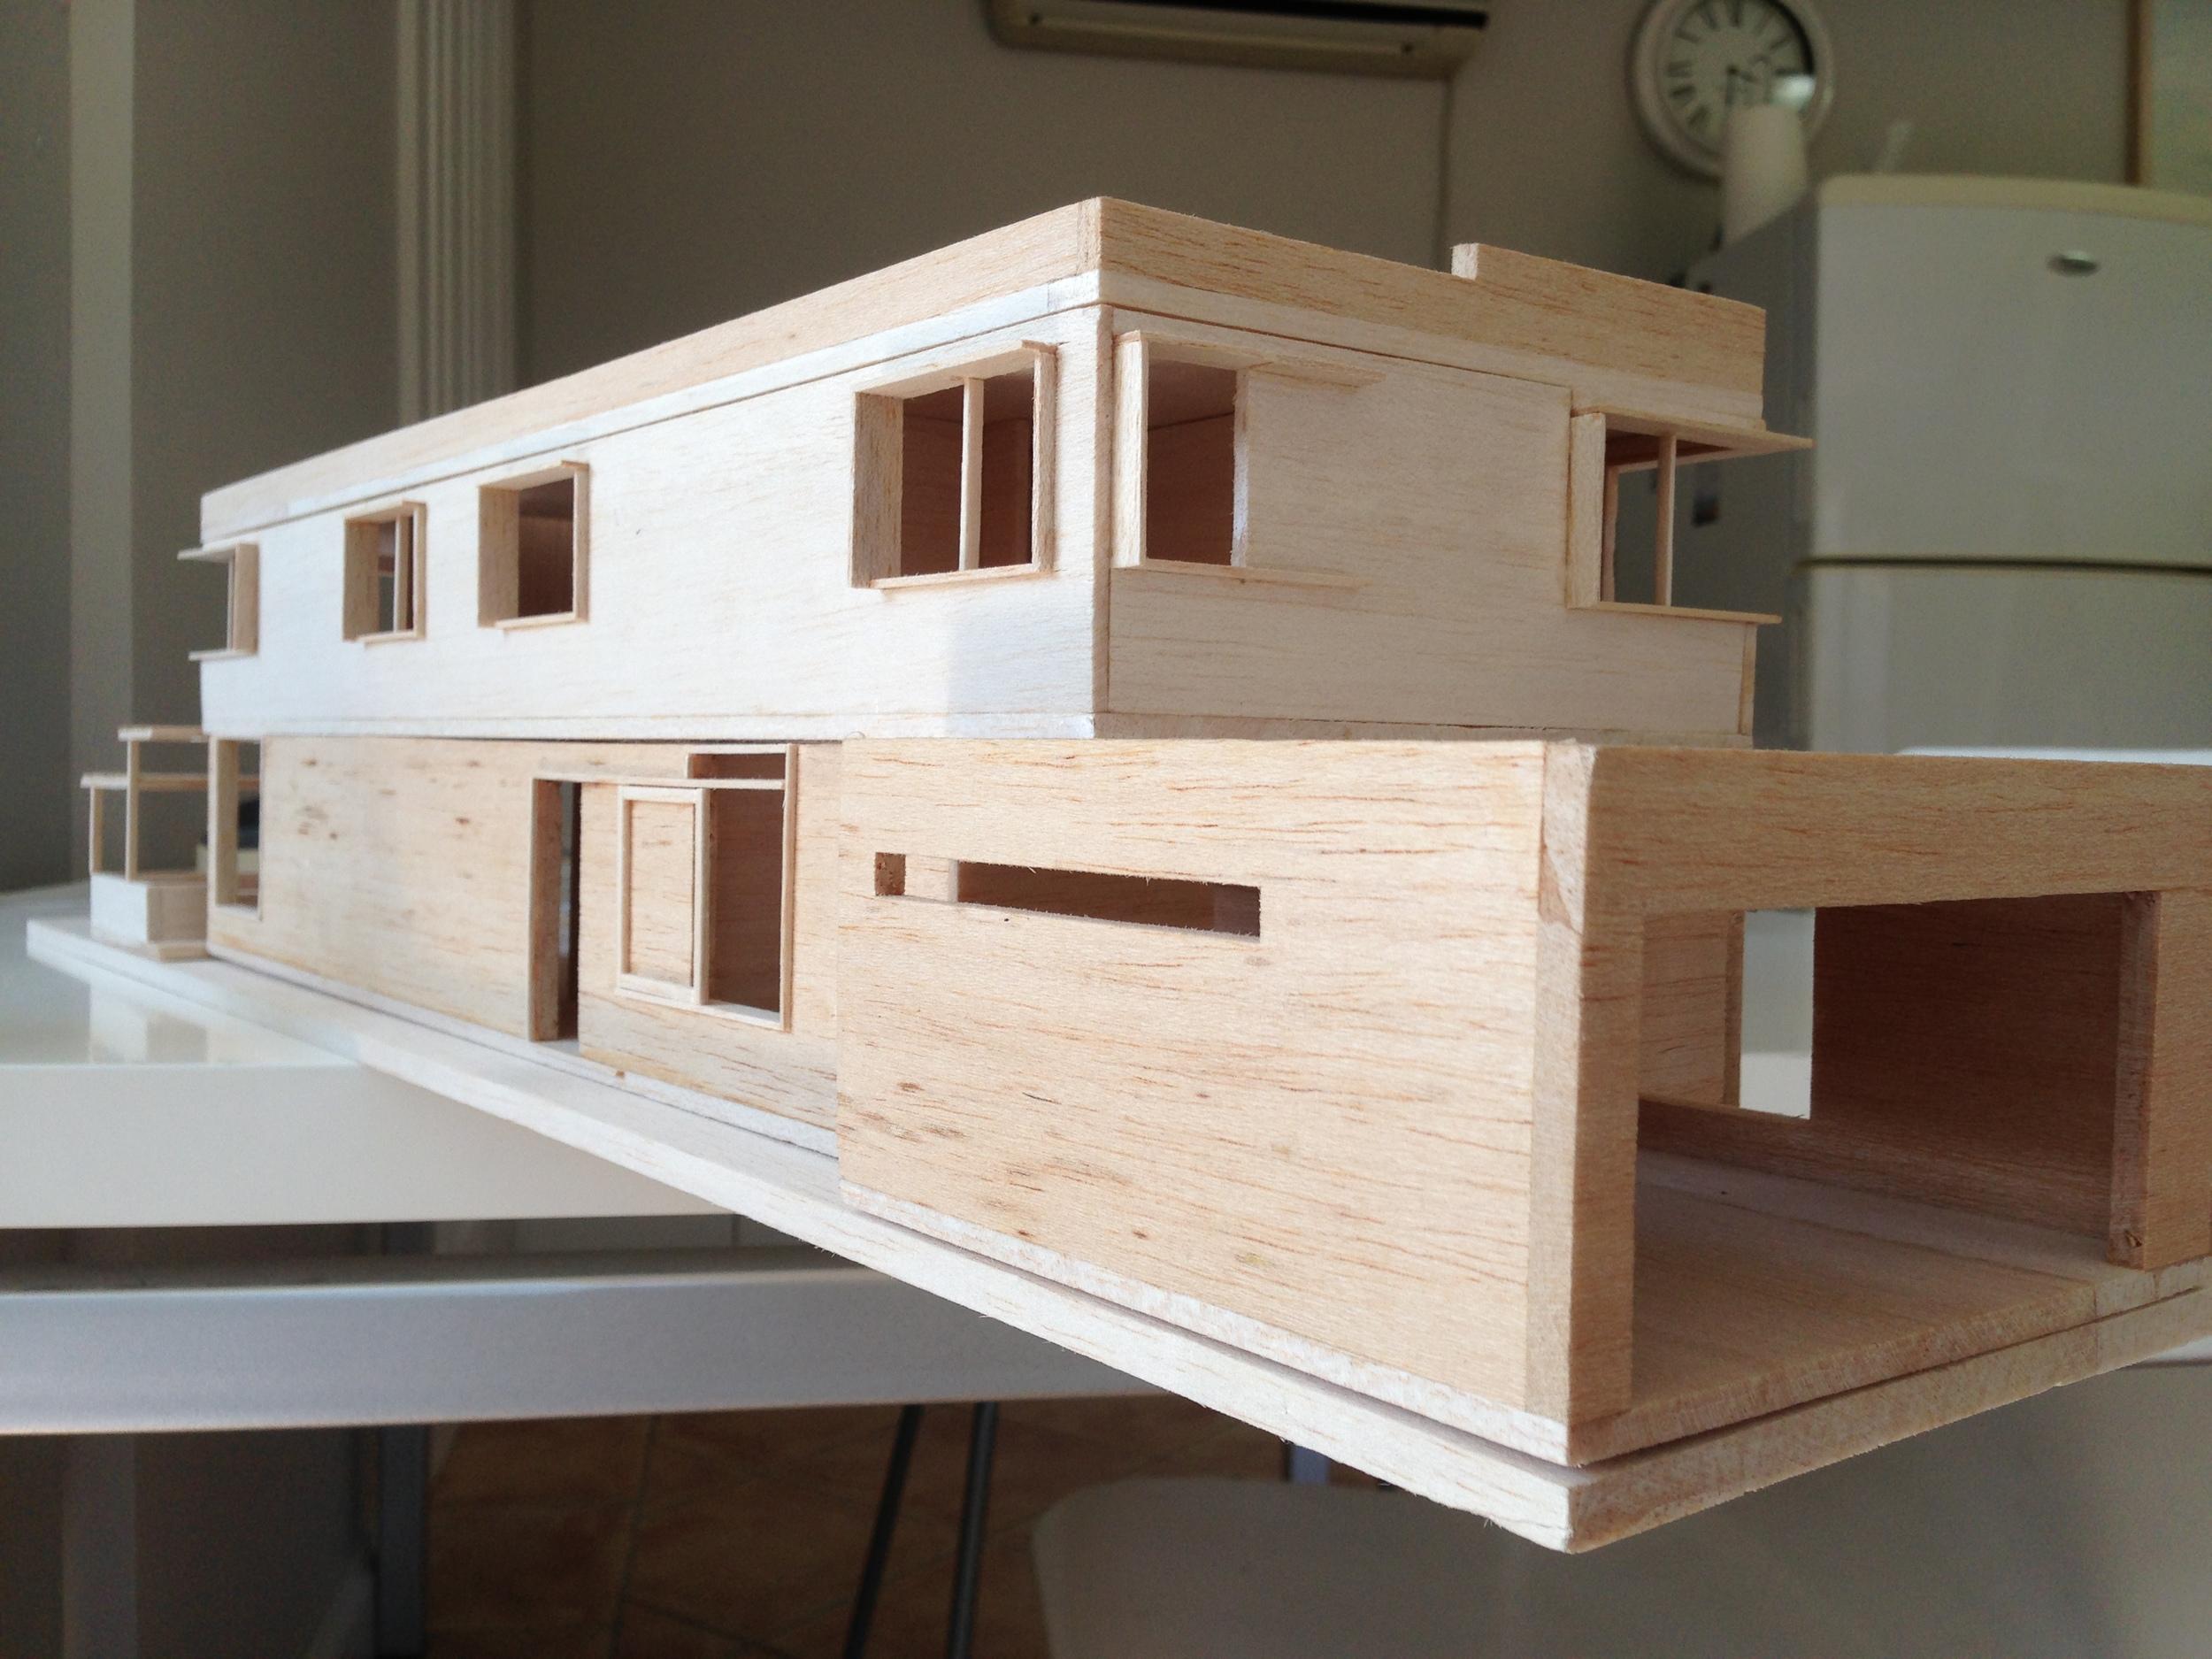 final concept model 3/4 front view